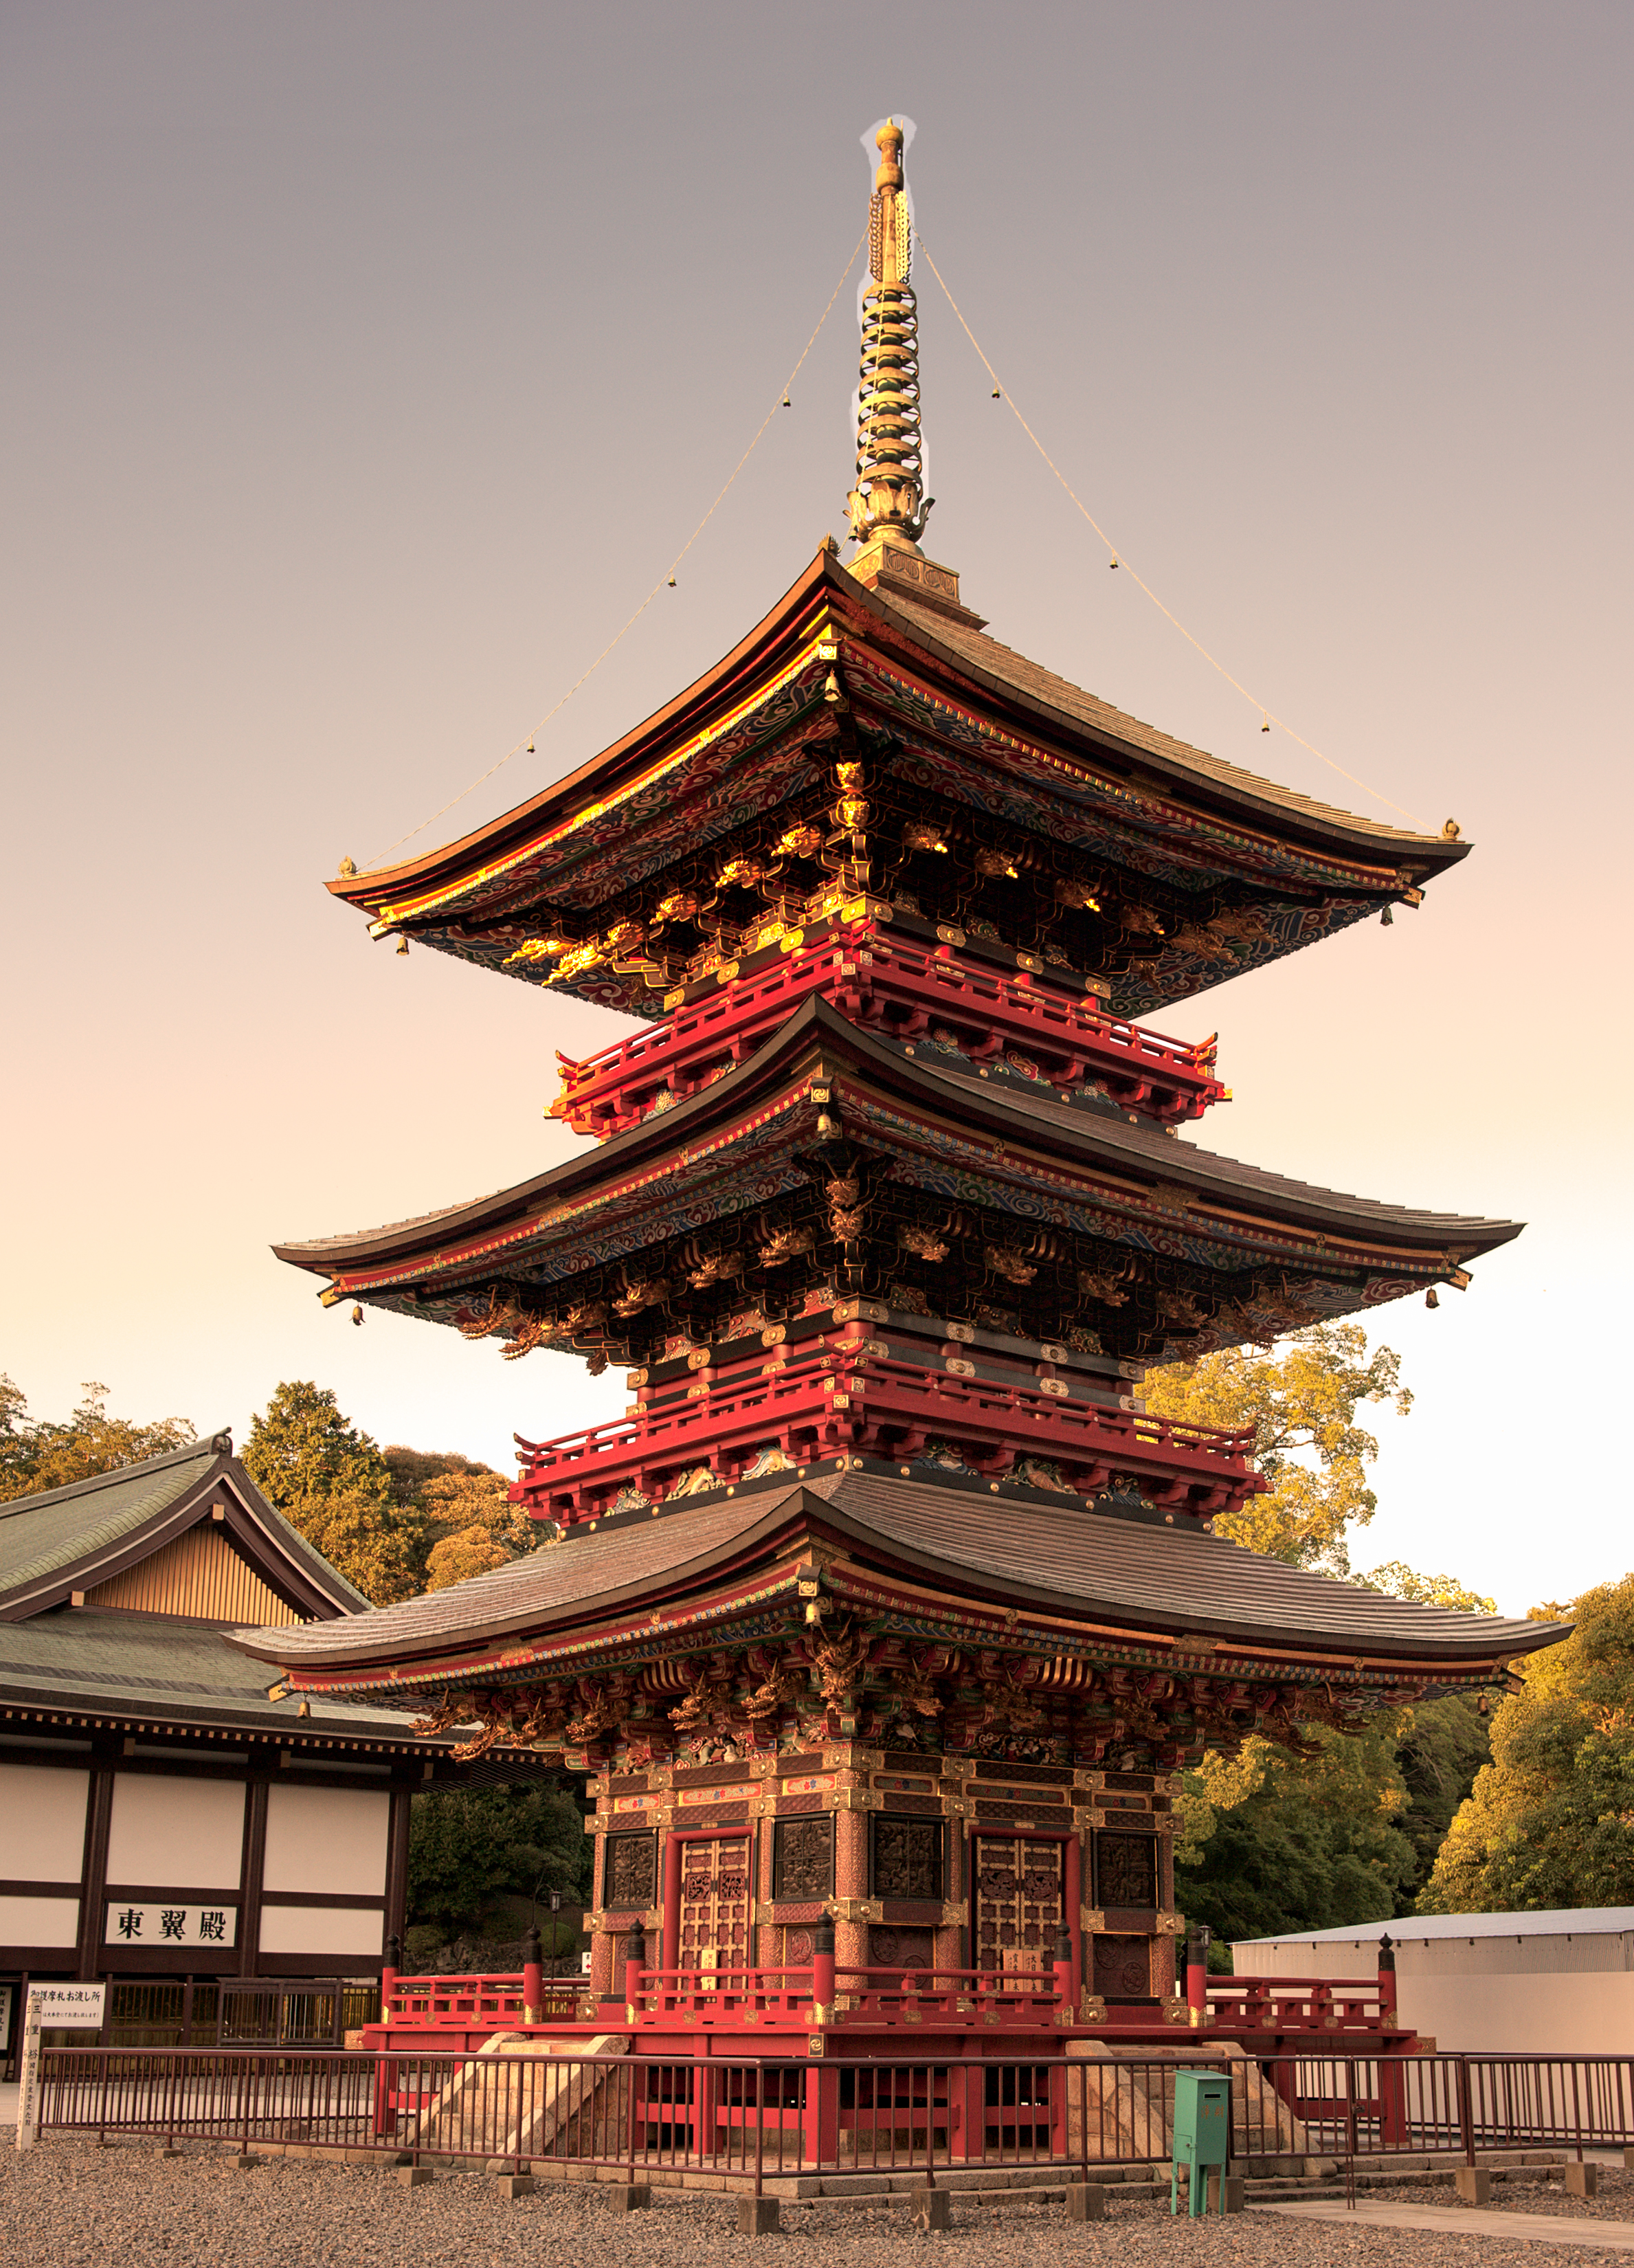 Japan-John Bardell-0460a.jpg